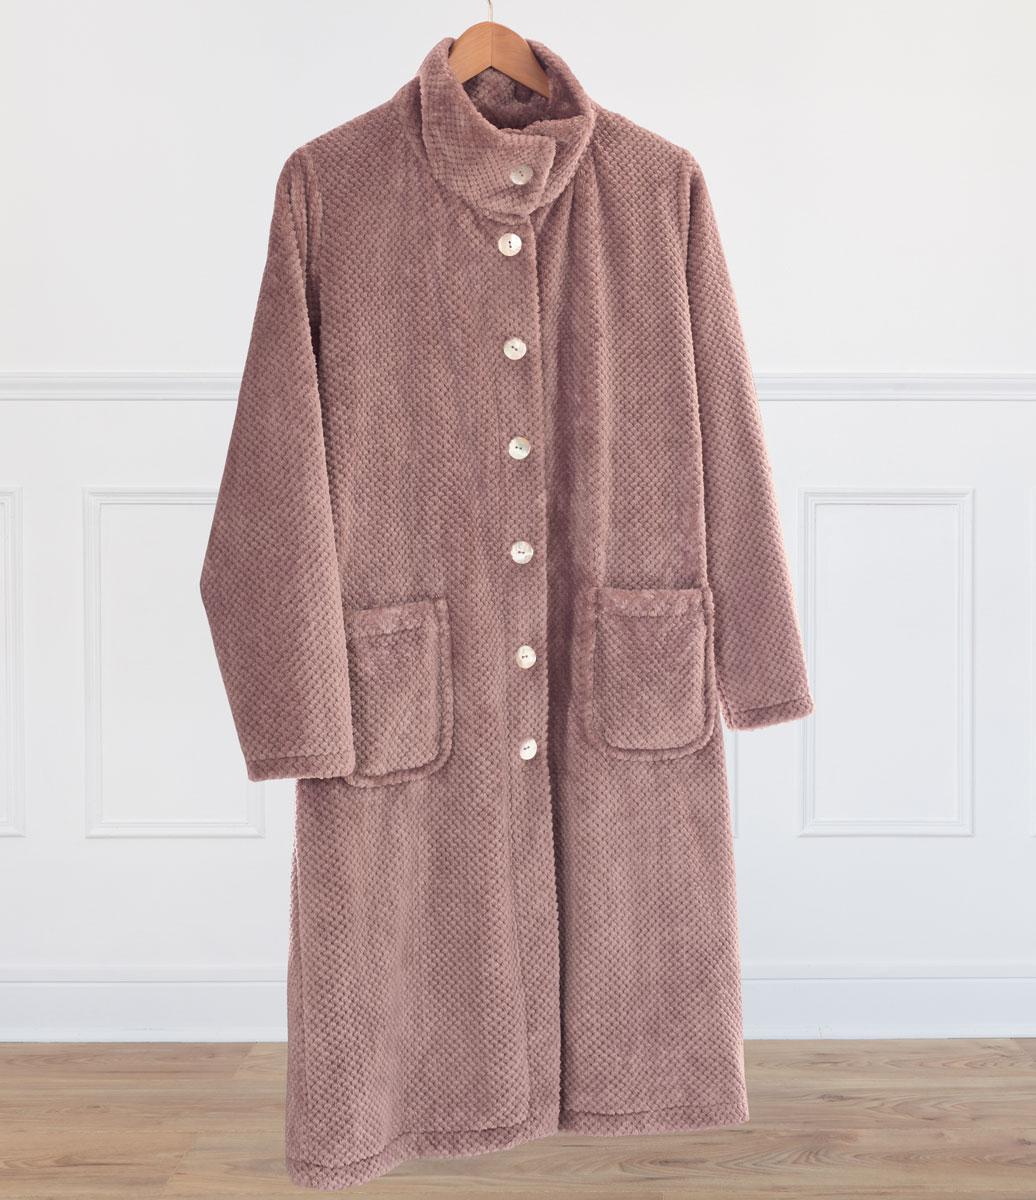 Maison Linge De Femme Kimono Robe Et Linvosges Chambre v6yYb7fg